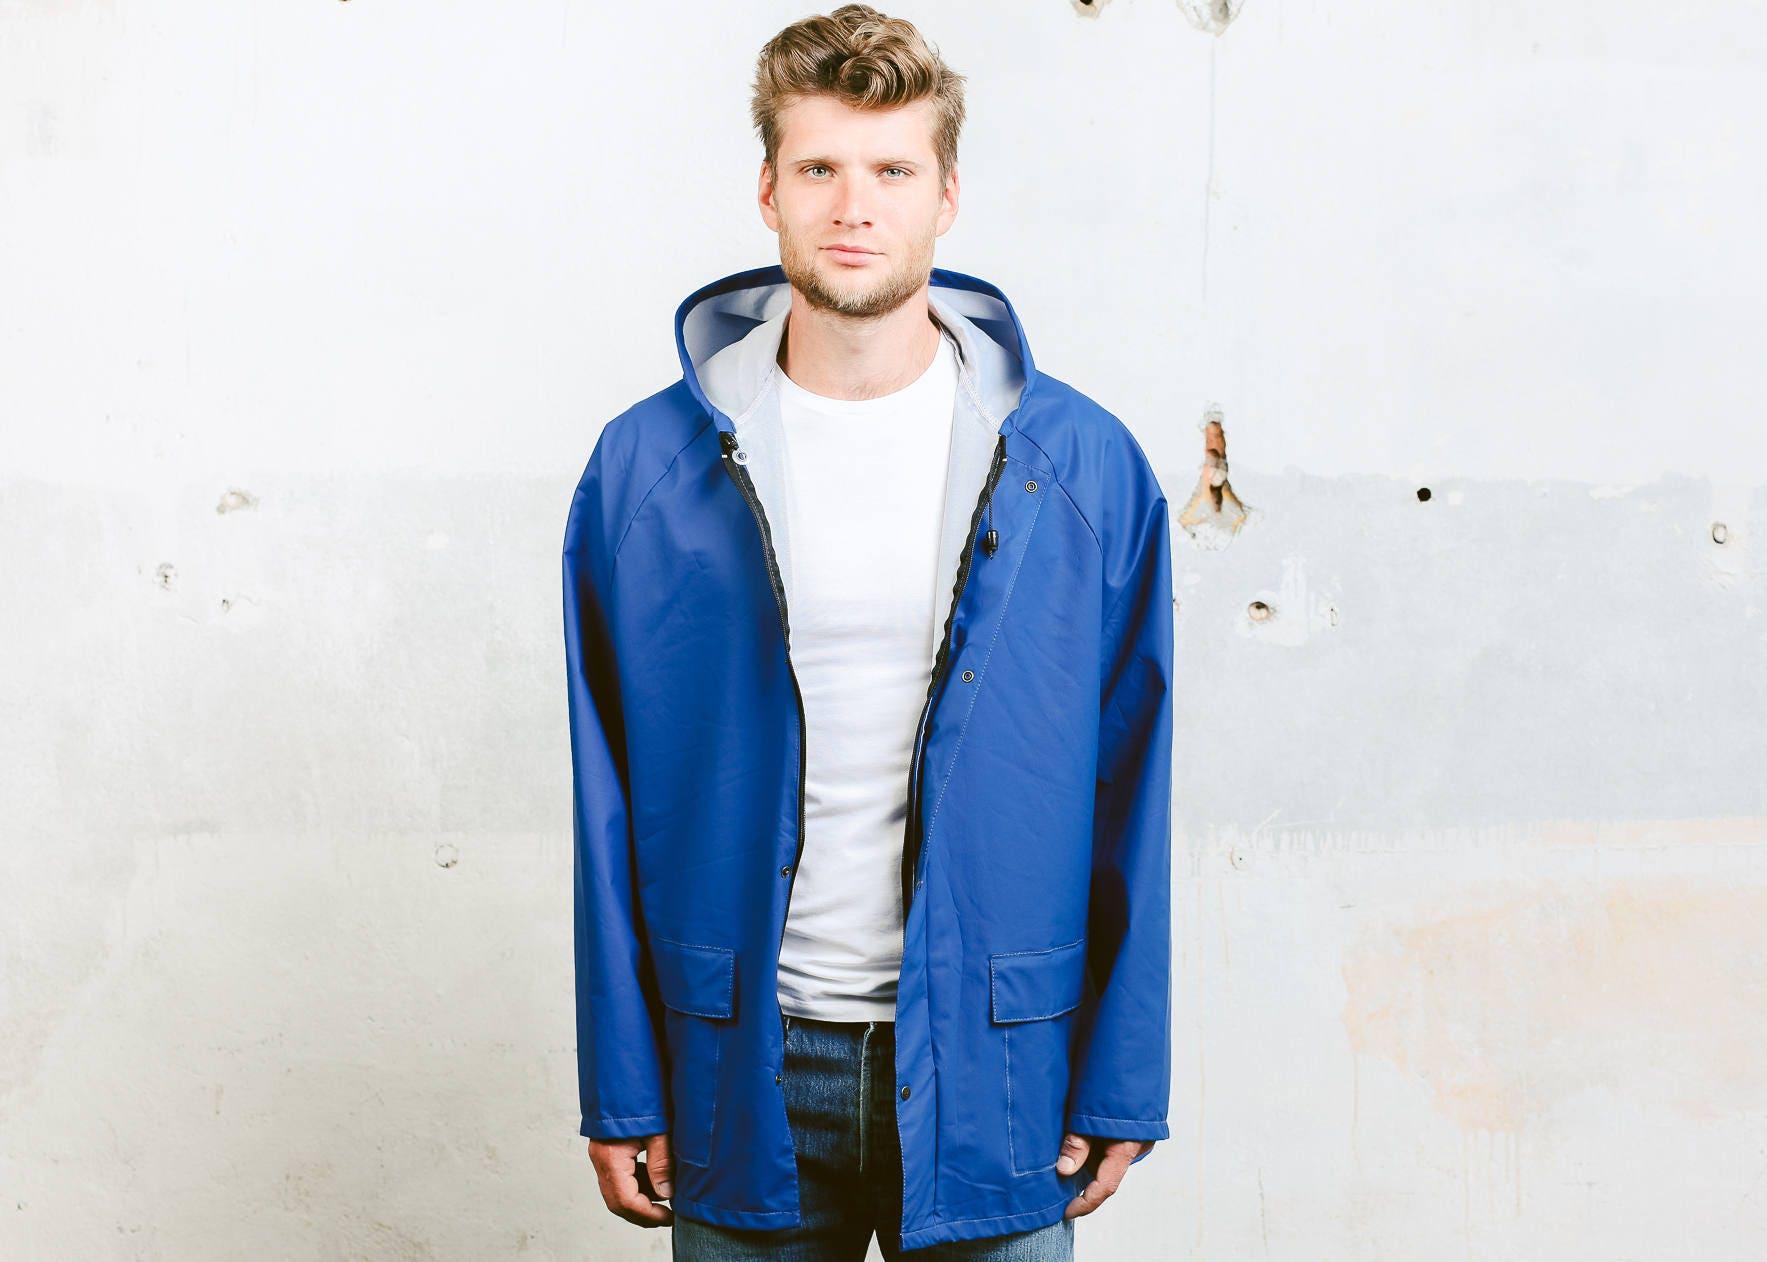 dd3dc862f Vintage Rain Jacket . 80s Windbreaker Jacket Festival Coat Outerwear Mens  Coat Bold Blue Hooded Sports Activewear . size Extra Large